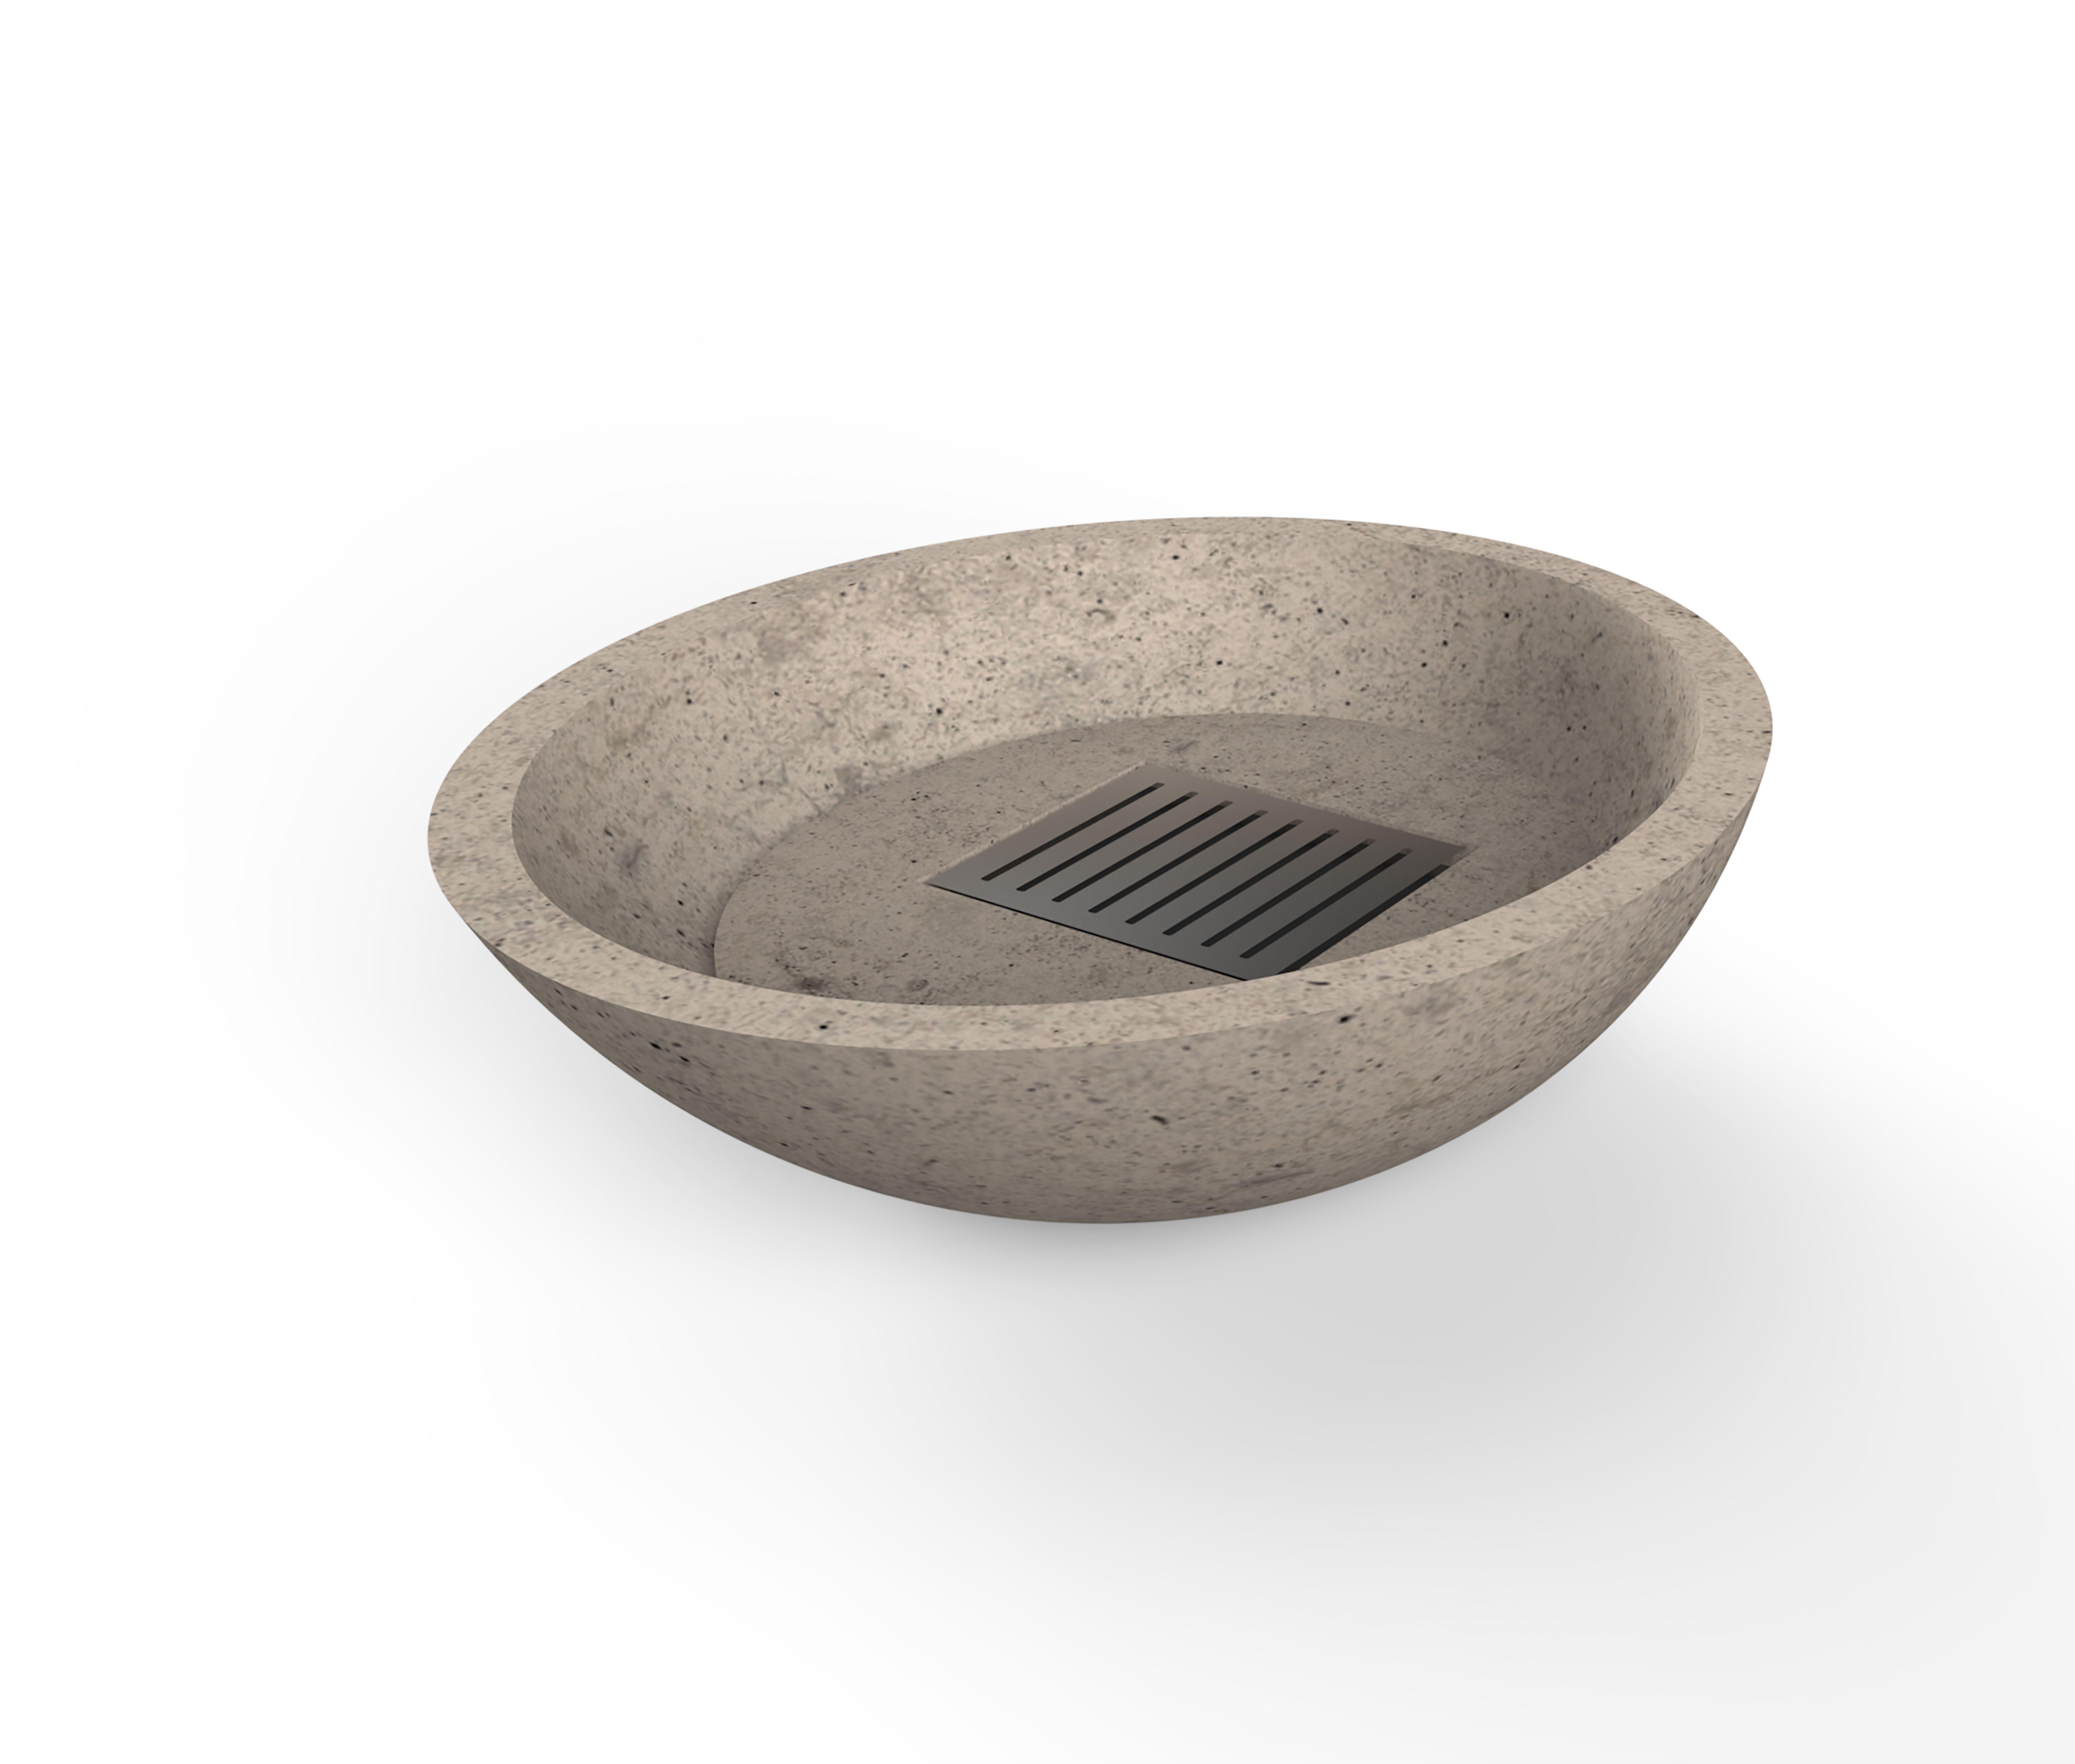 low fire bowl designed by 13 9 design for viteo austria